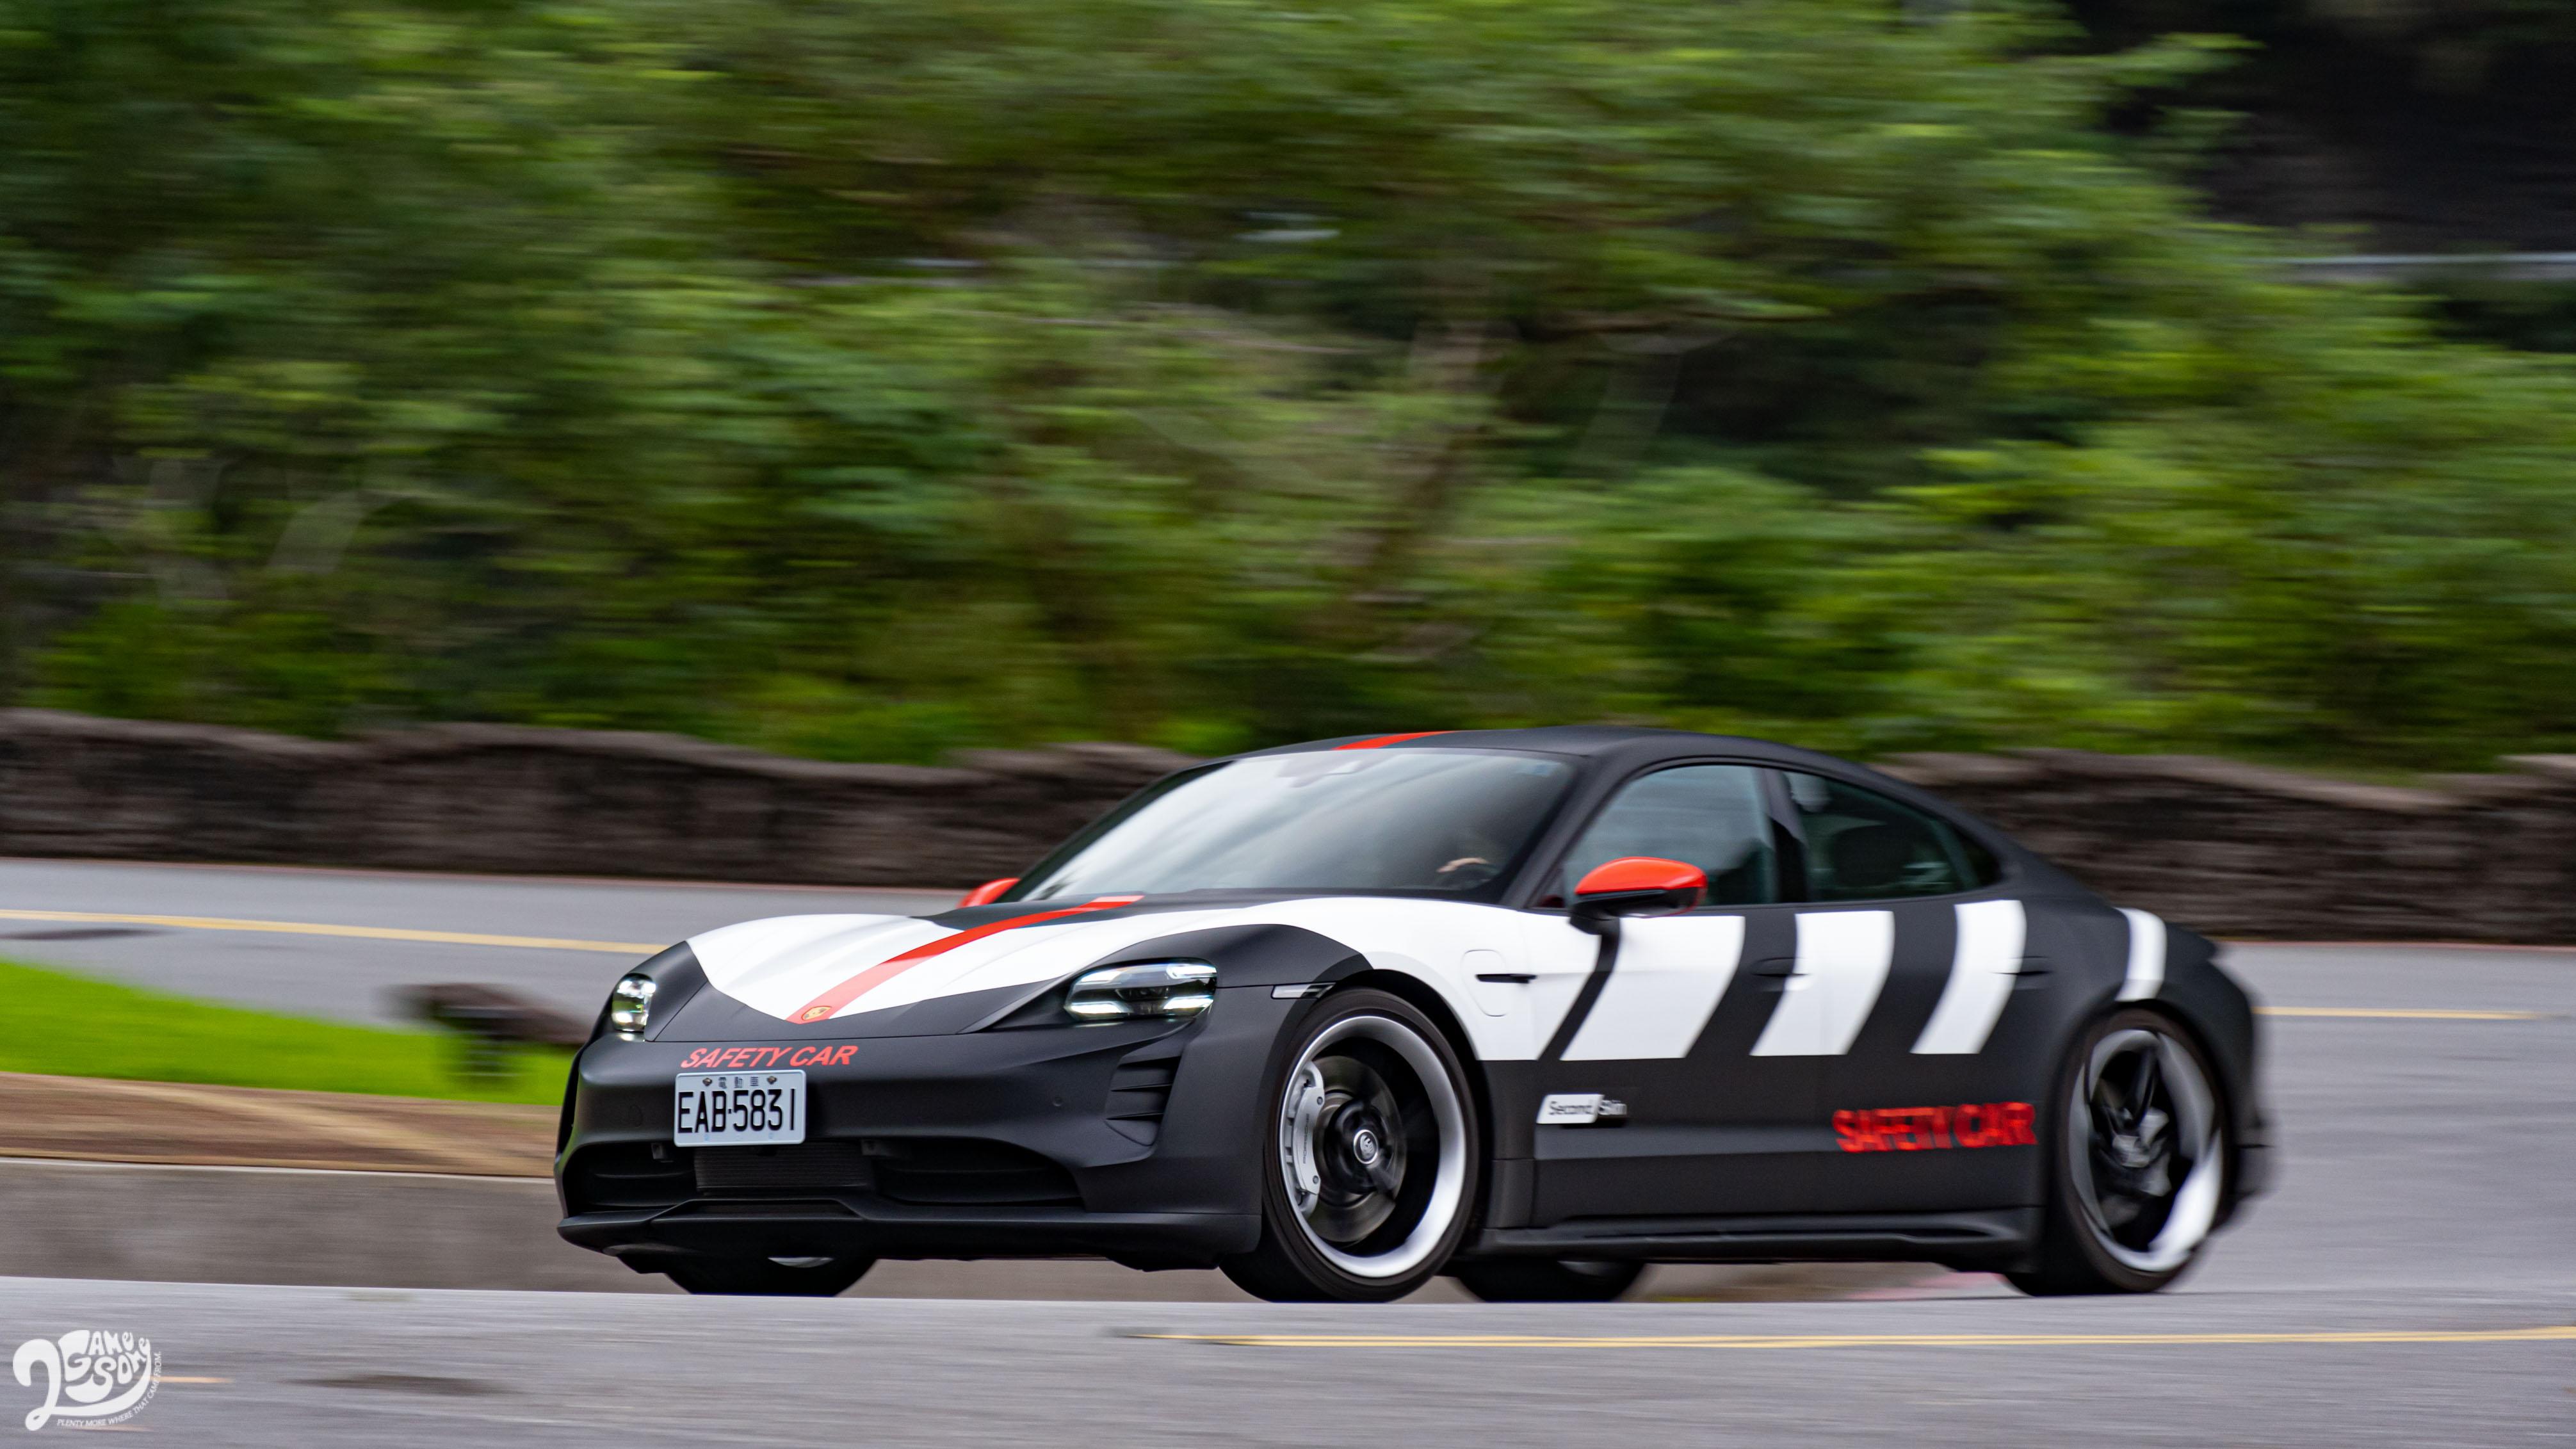 Porsche Taycan 還像不像個保時捷?【專題報導下集】